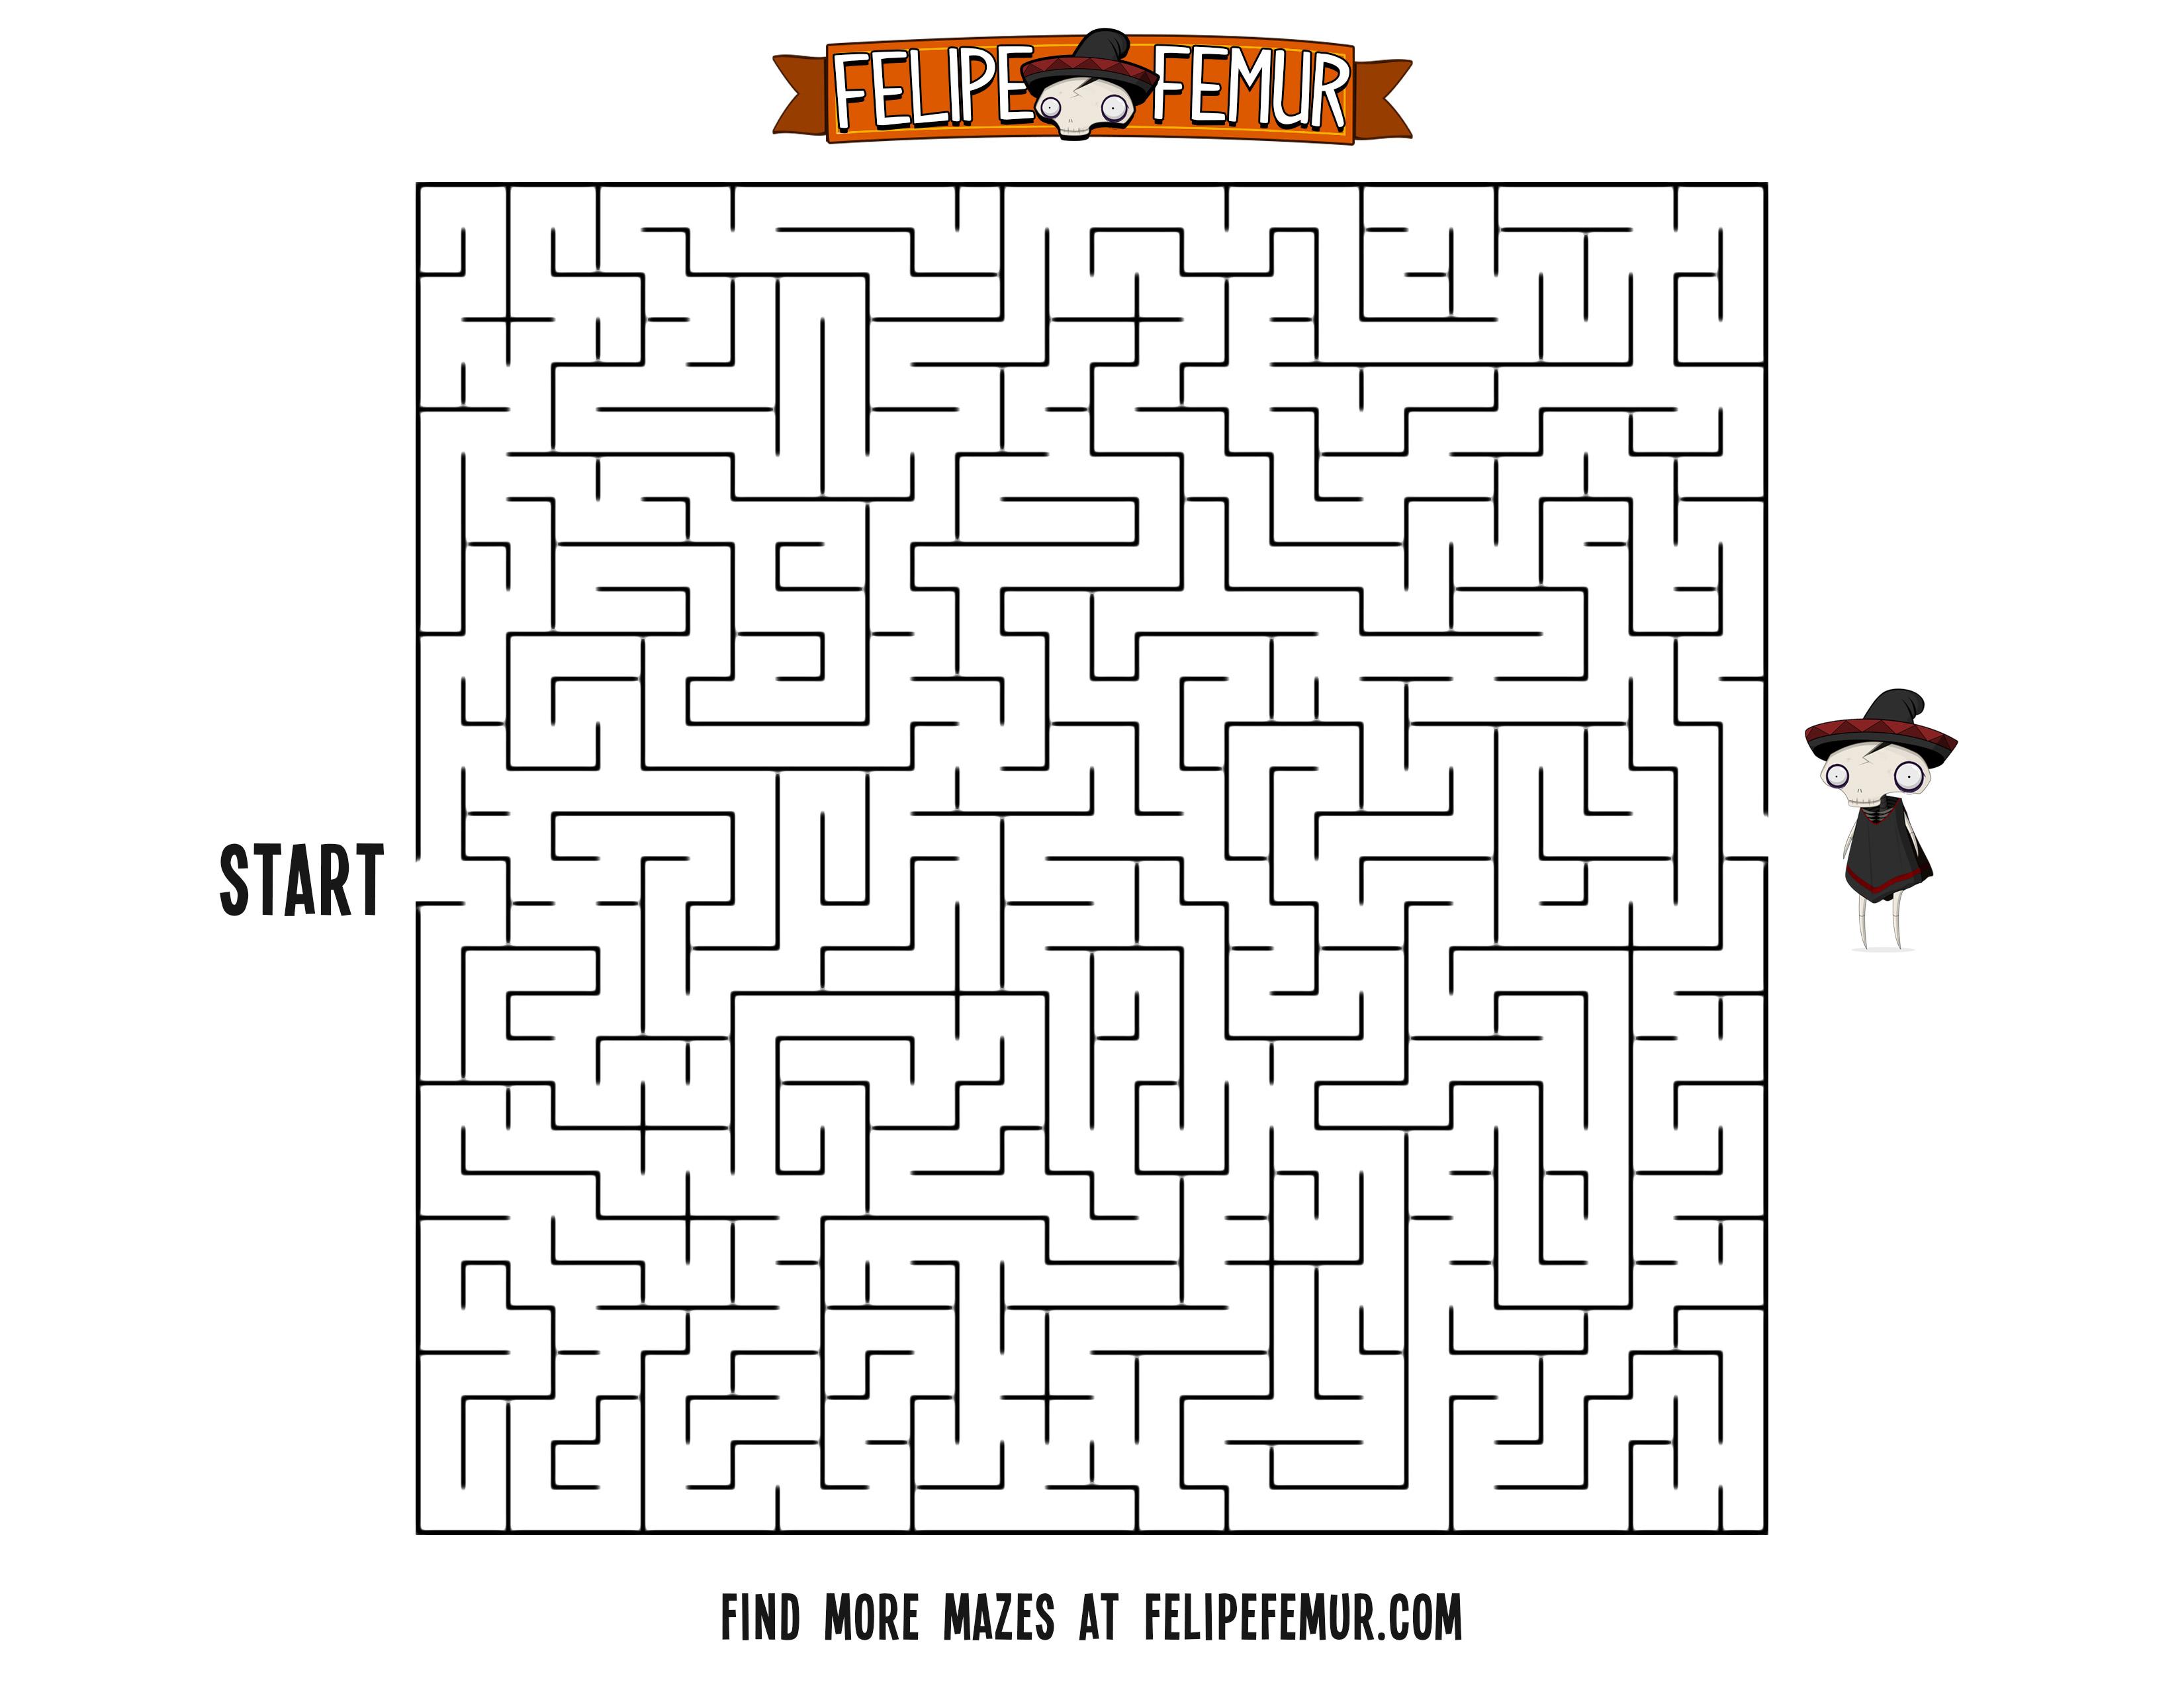 Free Maze Printout For Kids Square Maze 2 Felipe Femur